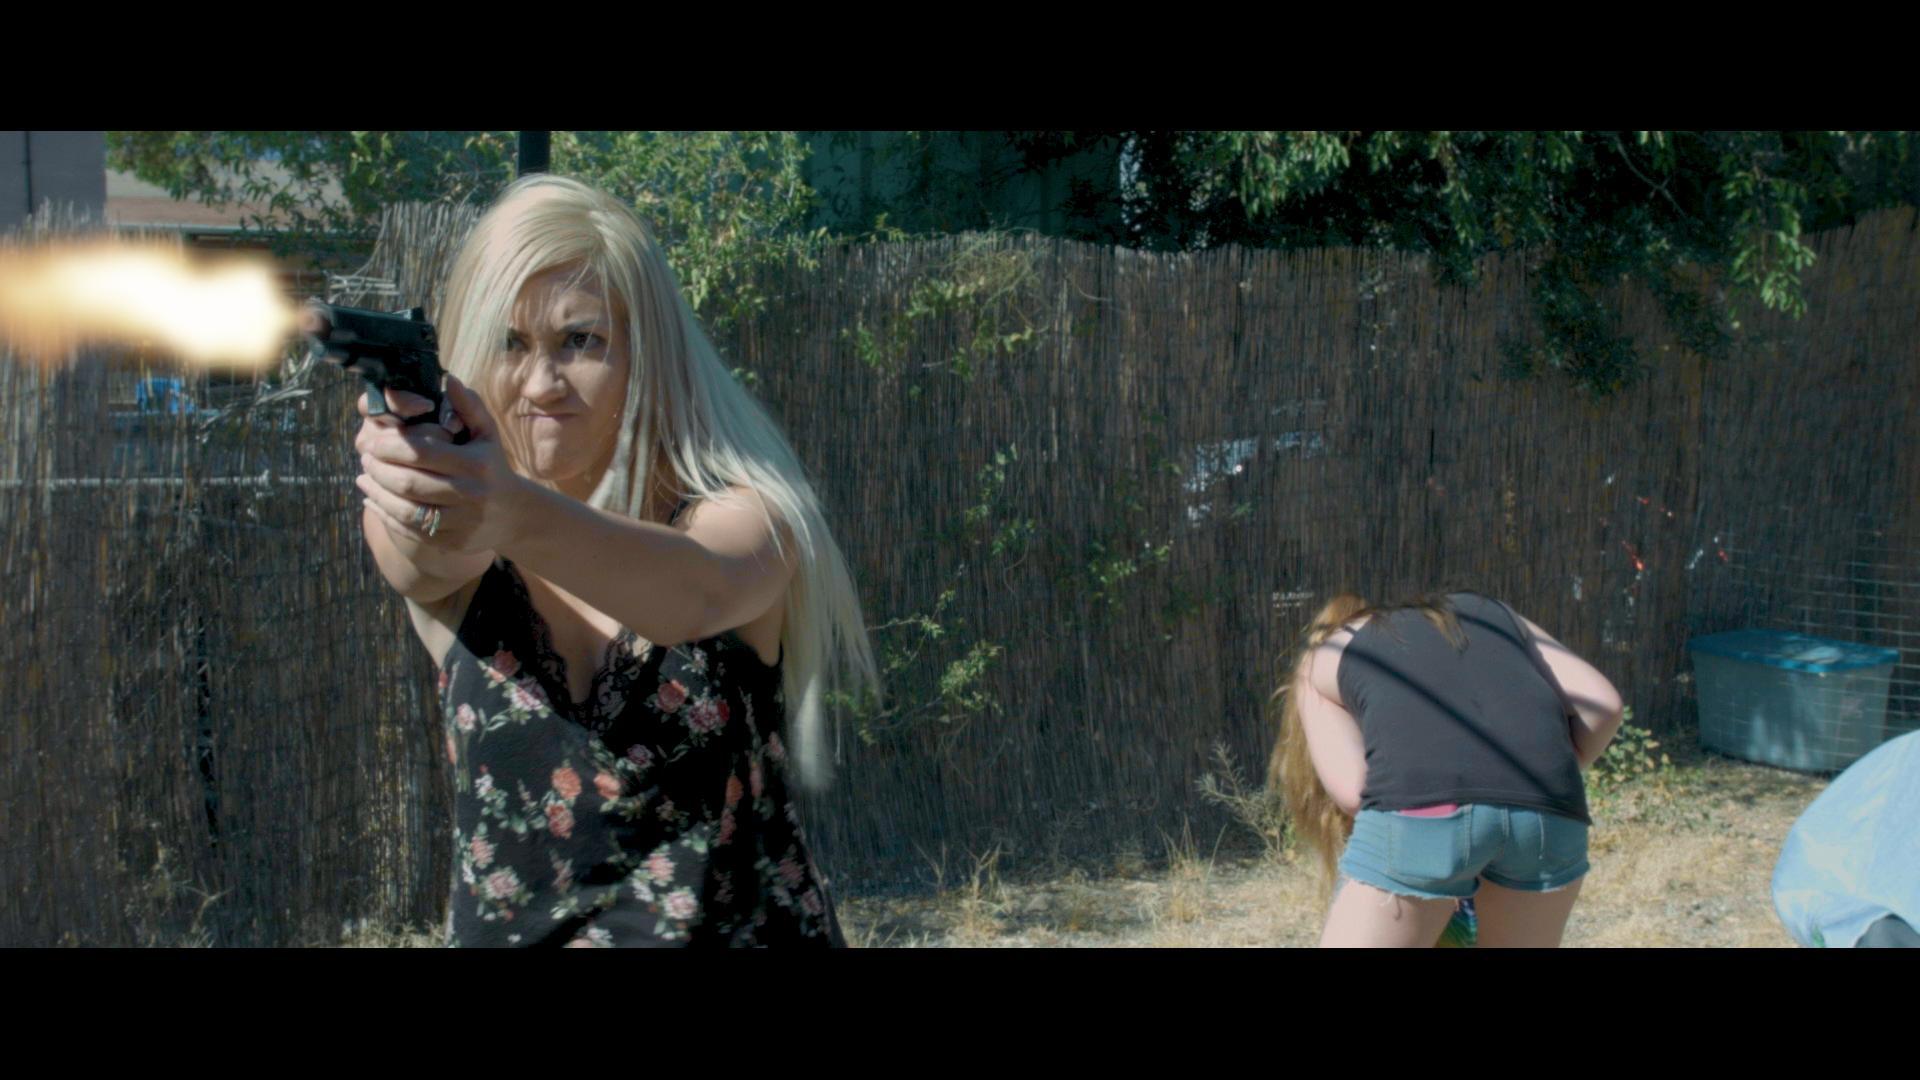 Sandra E Williams, Krissy Kapp, and Rihana Jordin Crowl in Garcia 2: The Rebirth (2020)